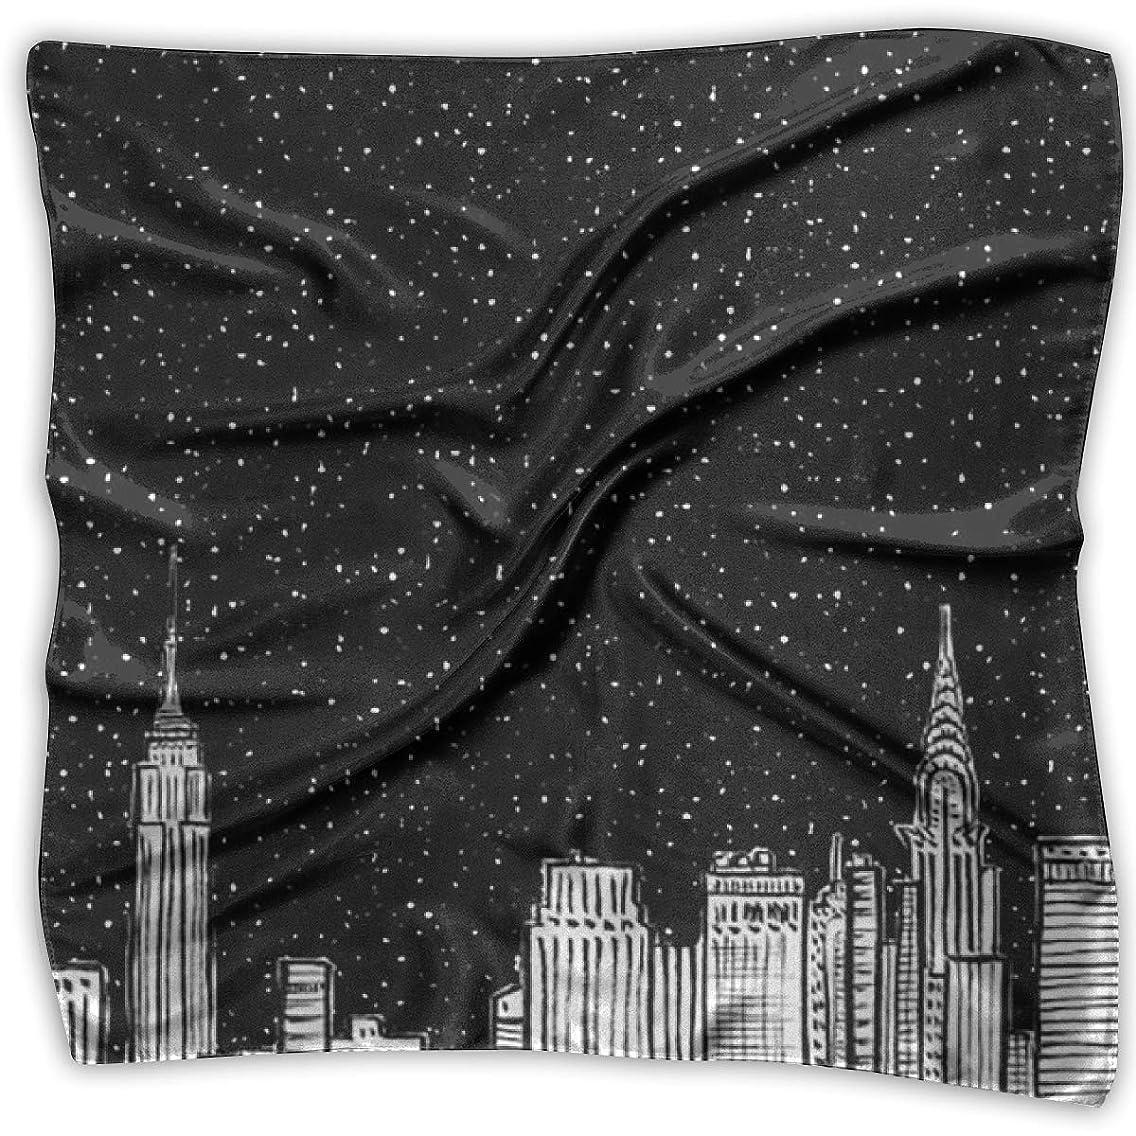 Square Satin Scarf City Night Silk Like Lightweight Bandanas Head Wrap Neck Shawl Headscarf